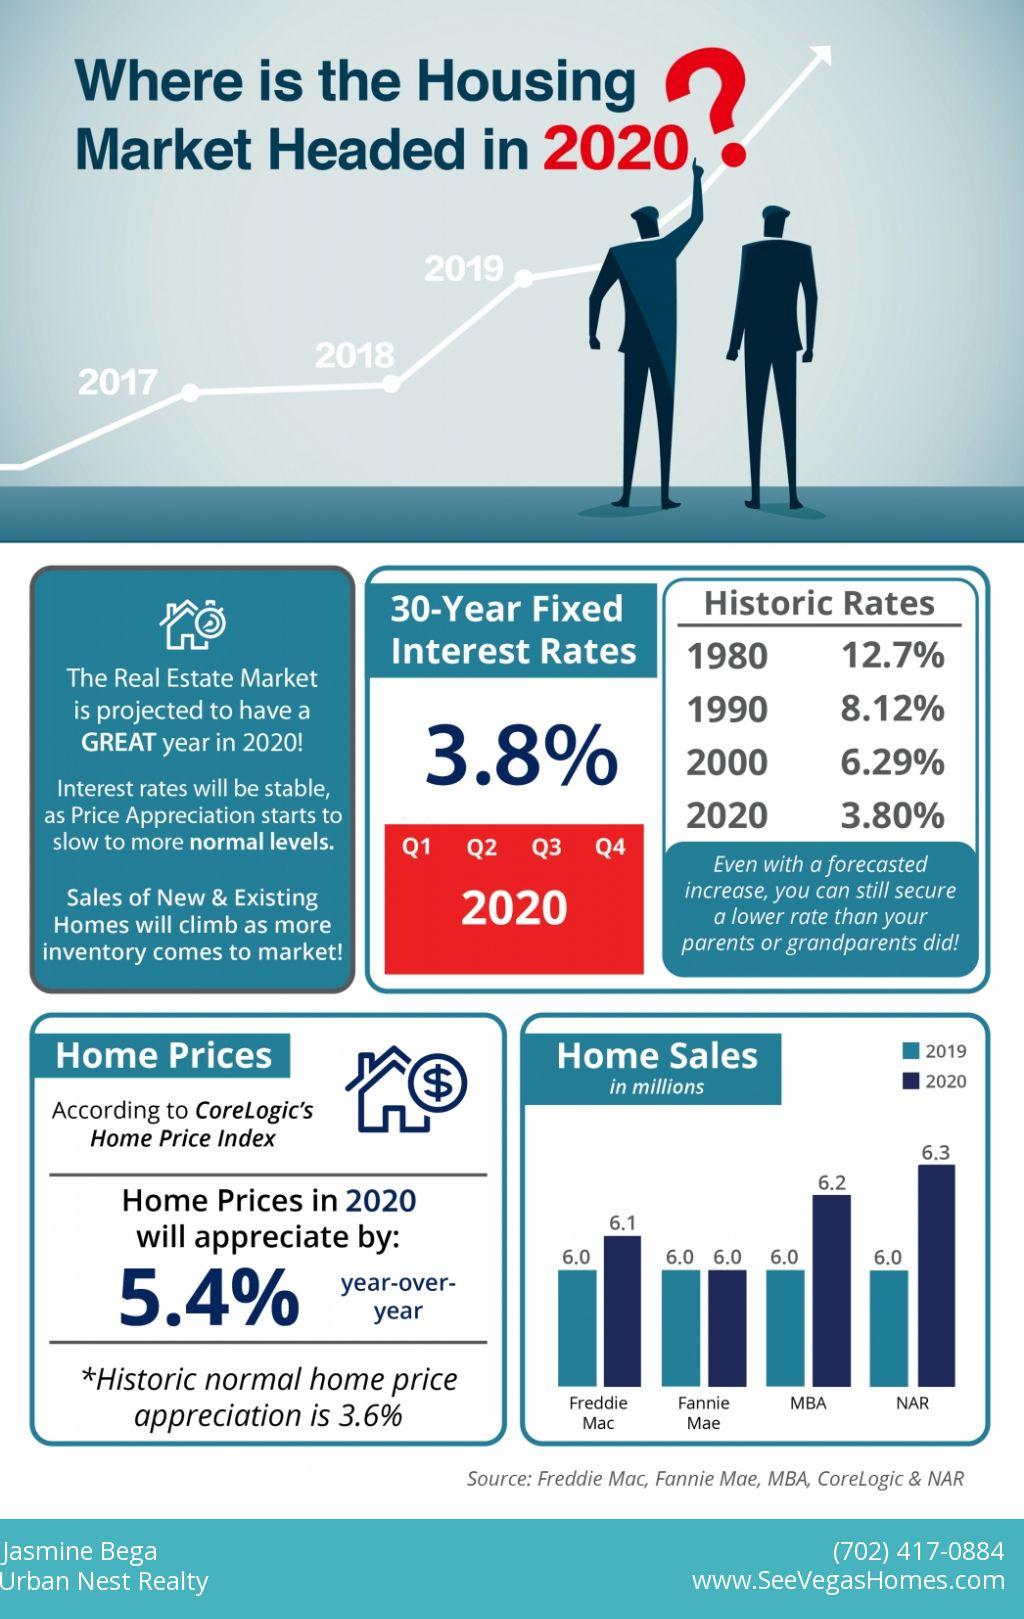 /userfiles/742/image/Where is the Housing Market Headed in 2020 SeeVegasHomes.jpg